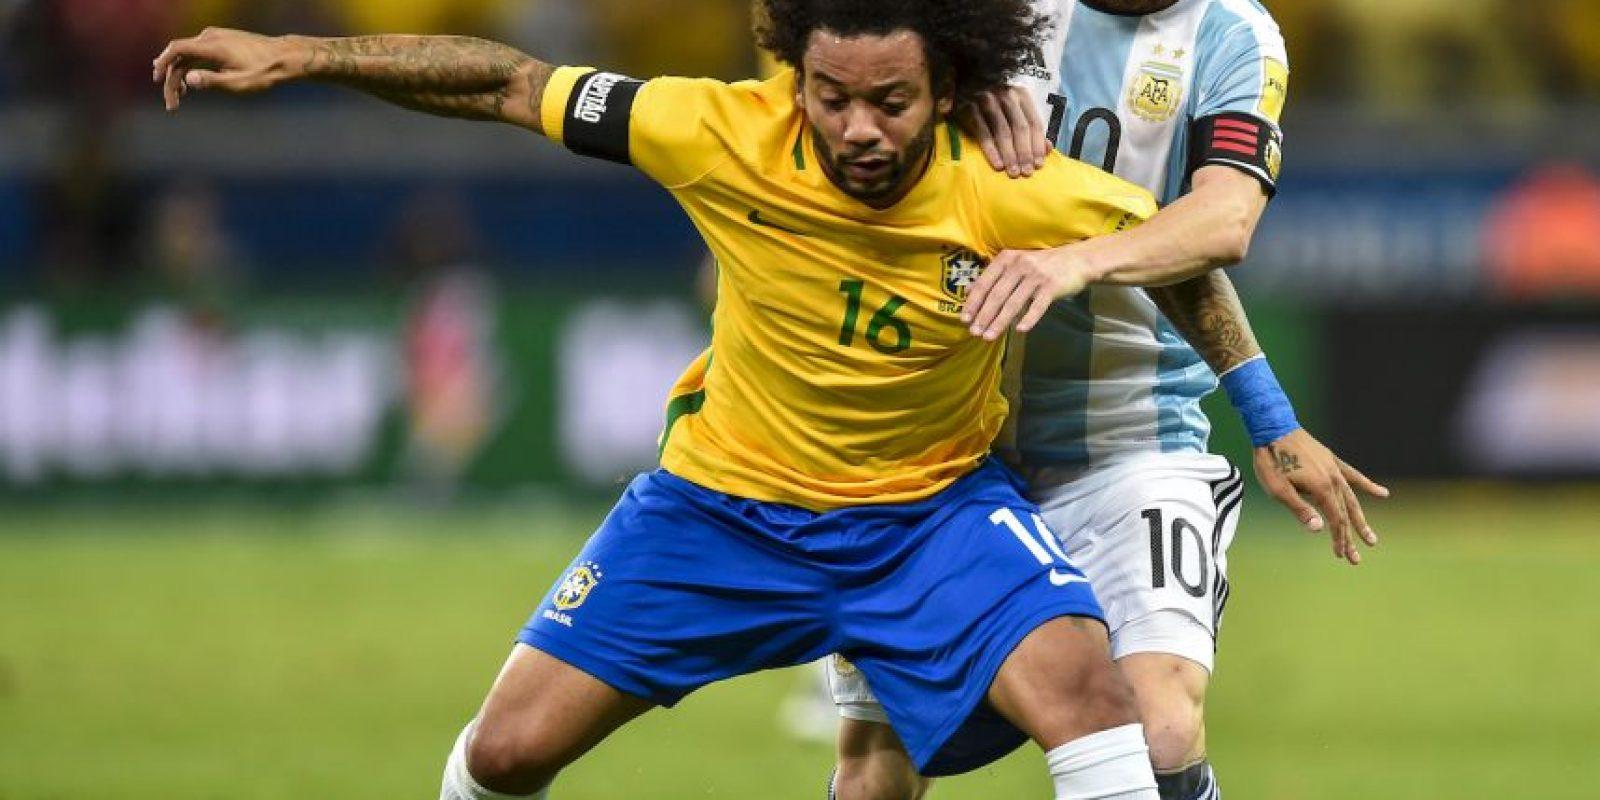 Mejores imágenes del partido Brasil vs. Argentina Foto:Getty Images